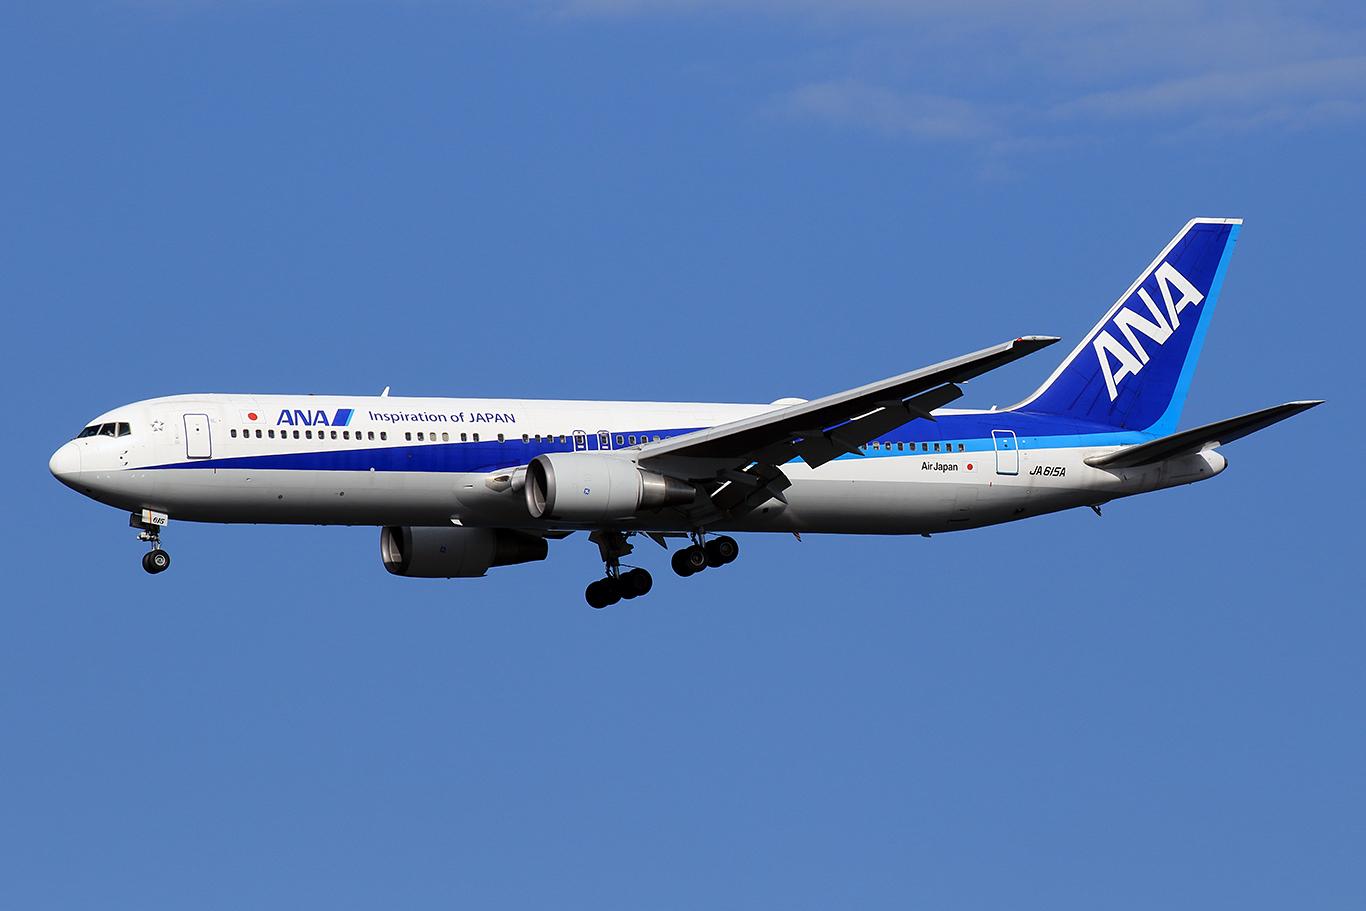 NH/ANA/全日空 NH30 B767-300ER JA615A